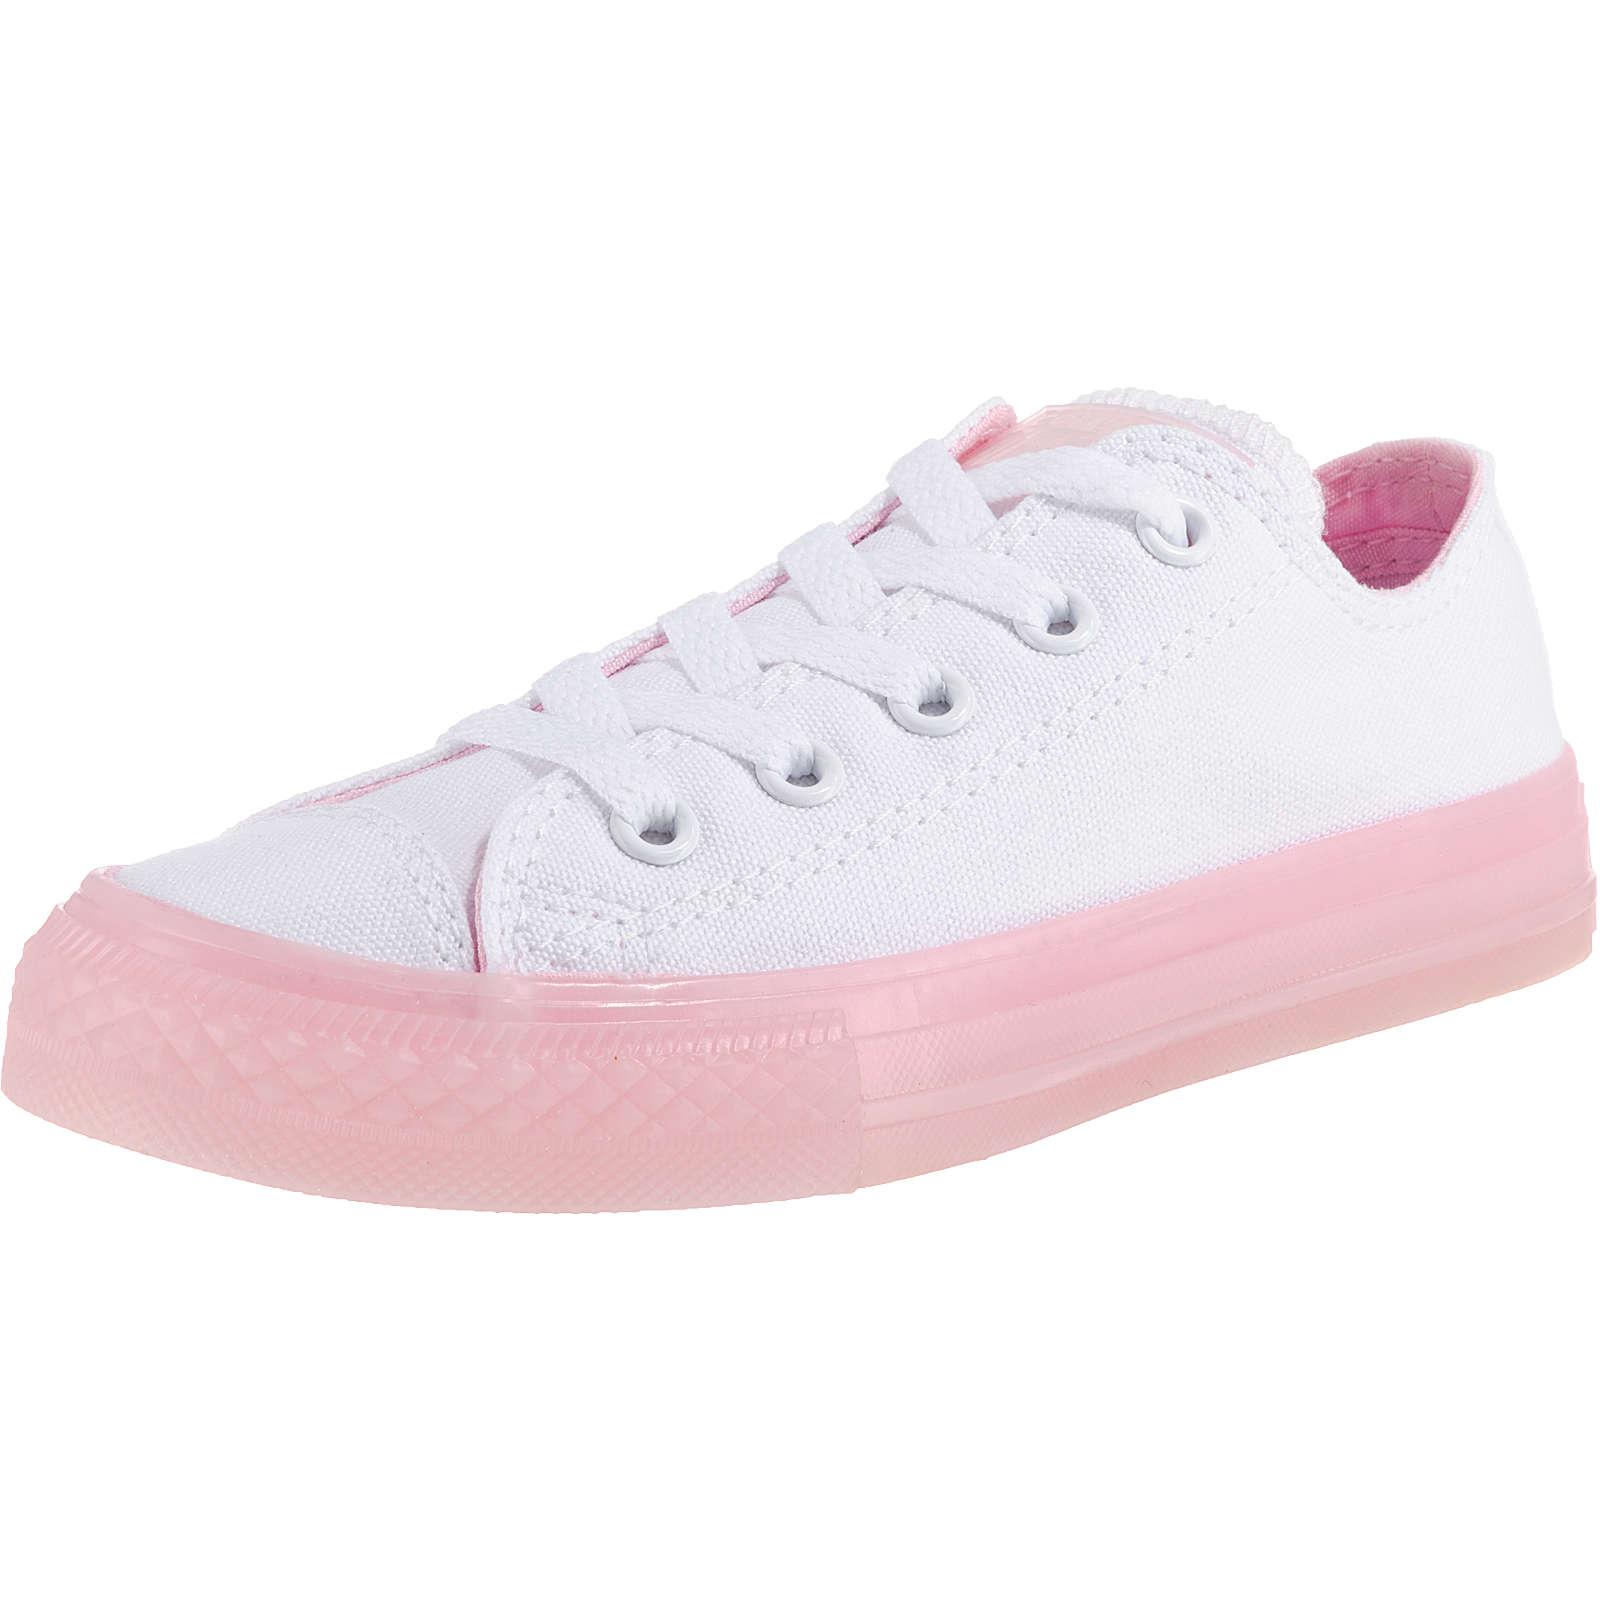 CONVERSE Kinder Sneakers Low Chuck Taylor All Star weiß Mädchen Gr. 28,5